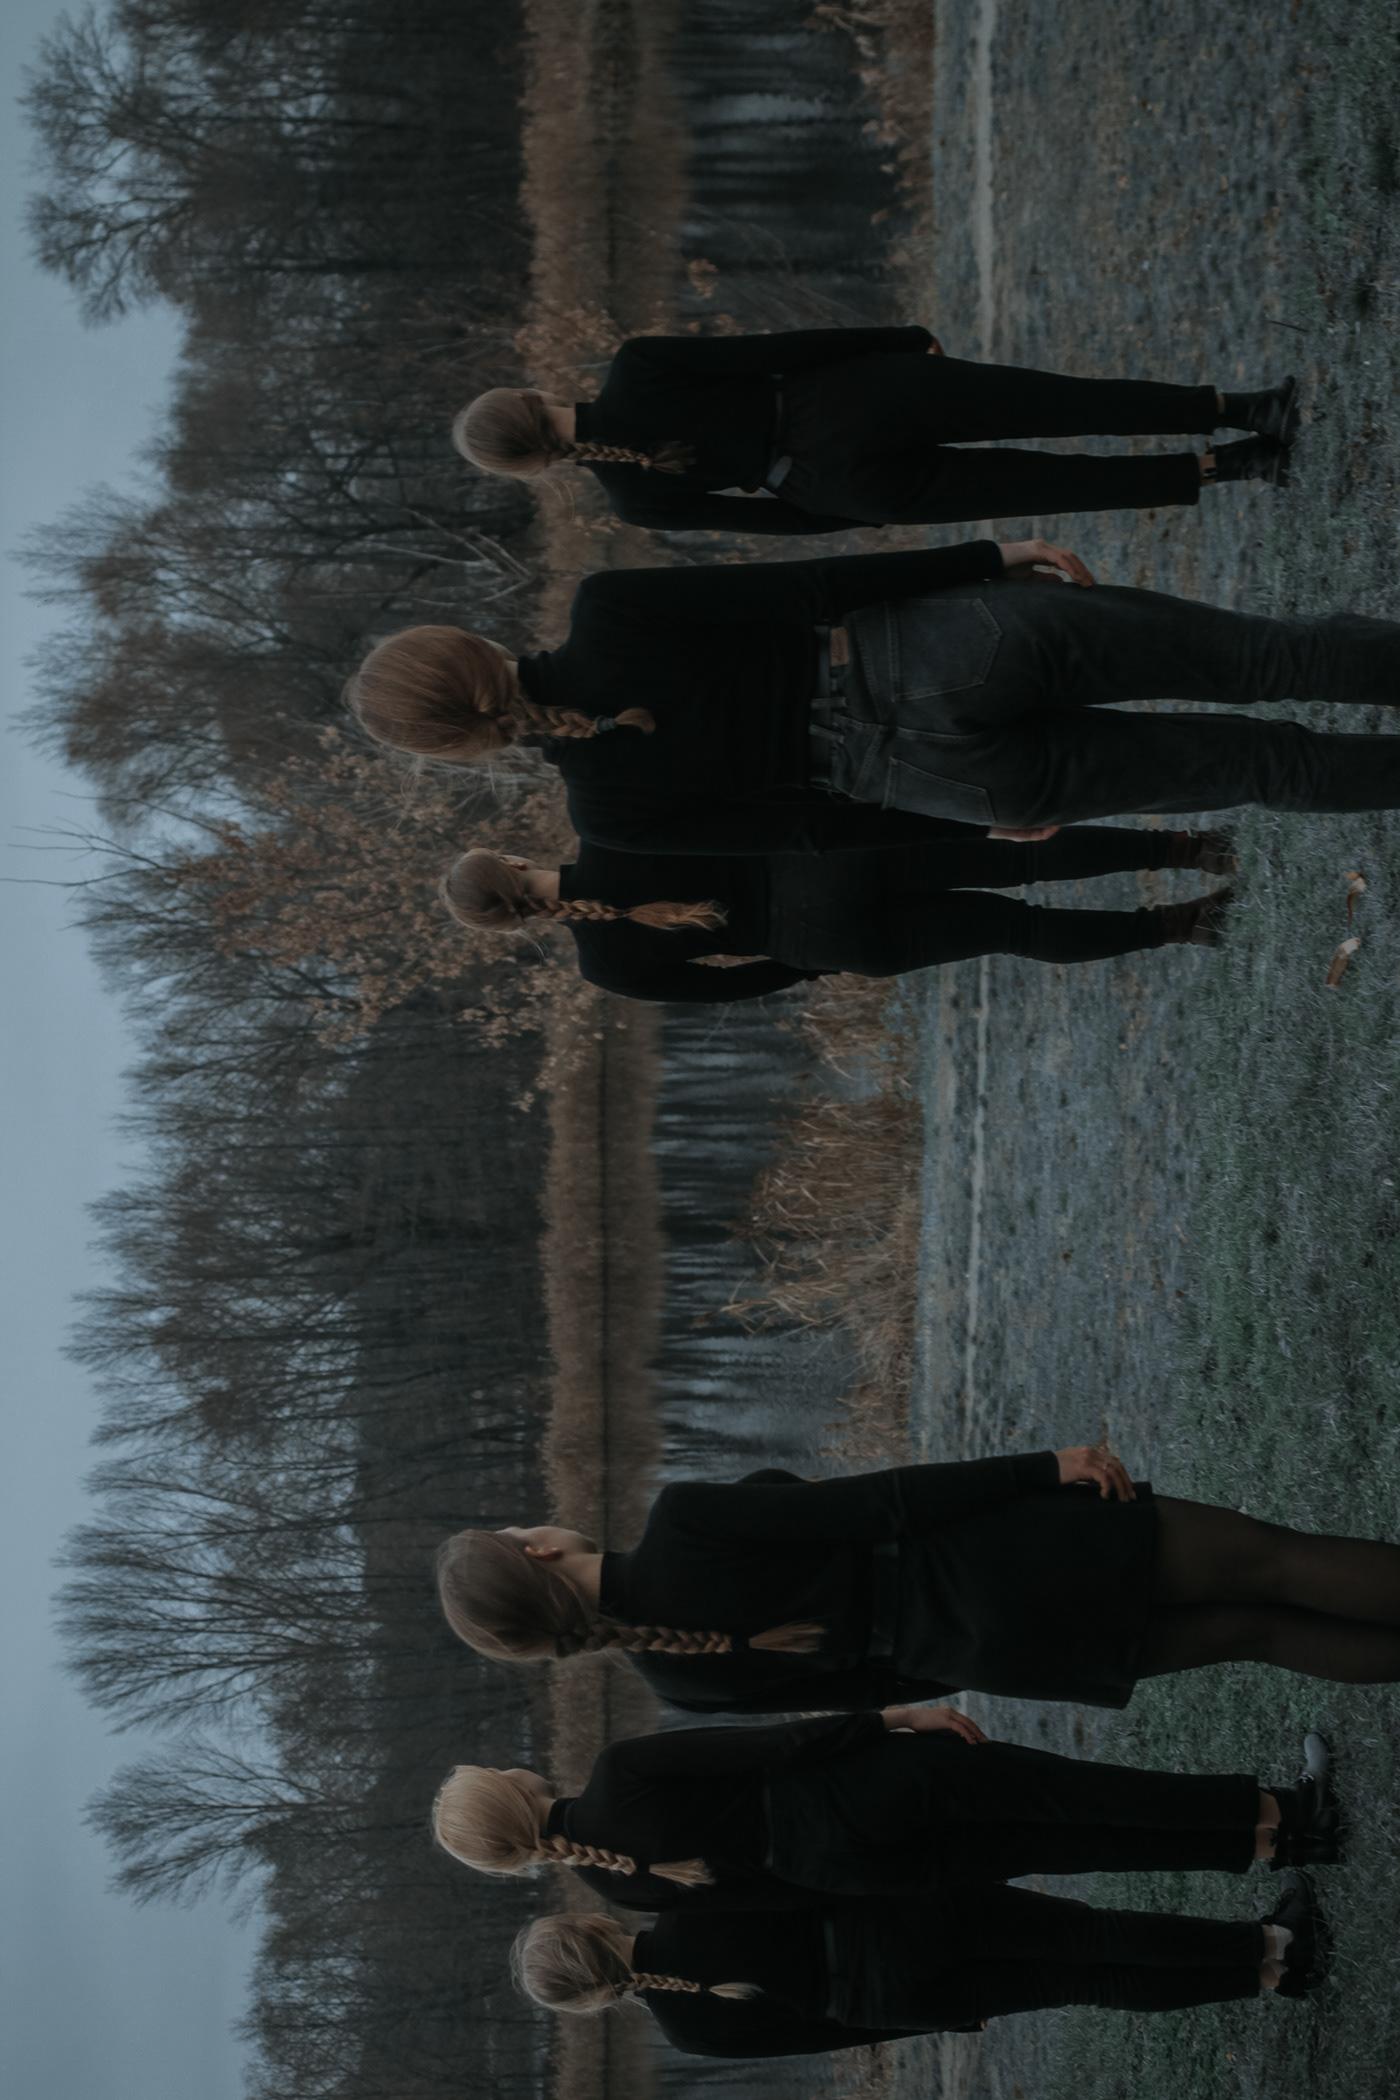 Image may contain: water and lake